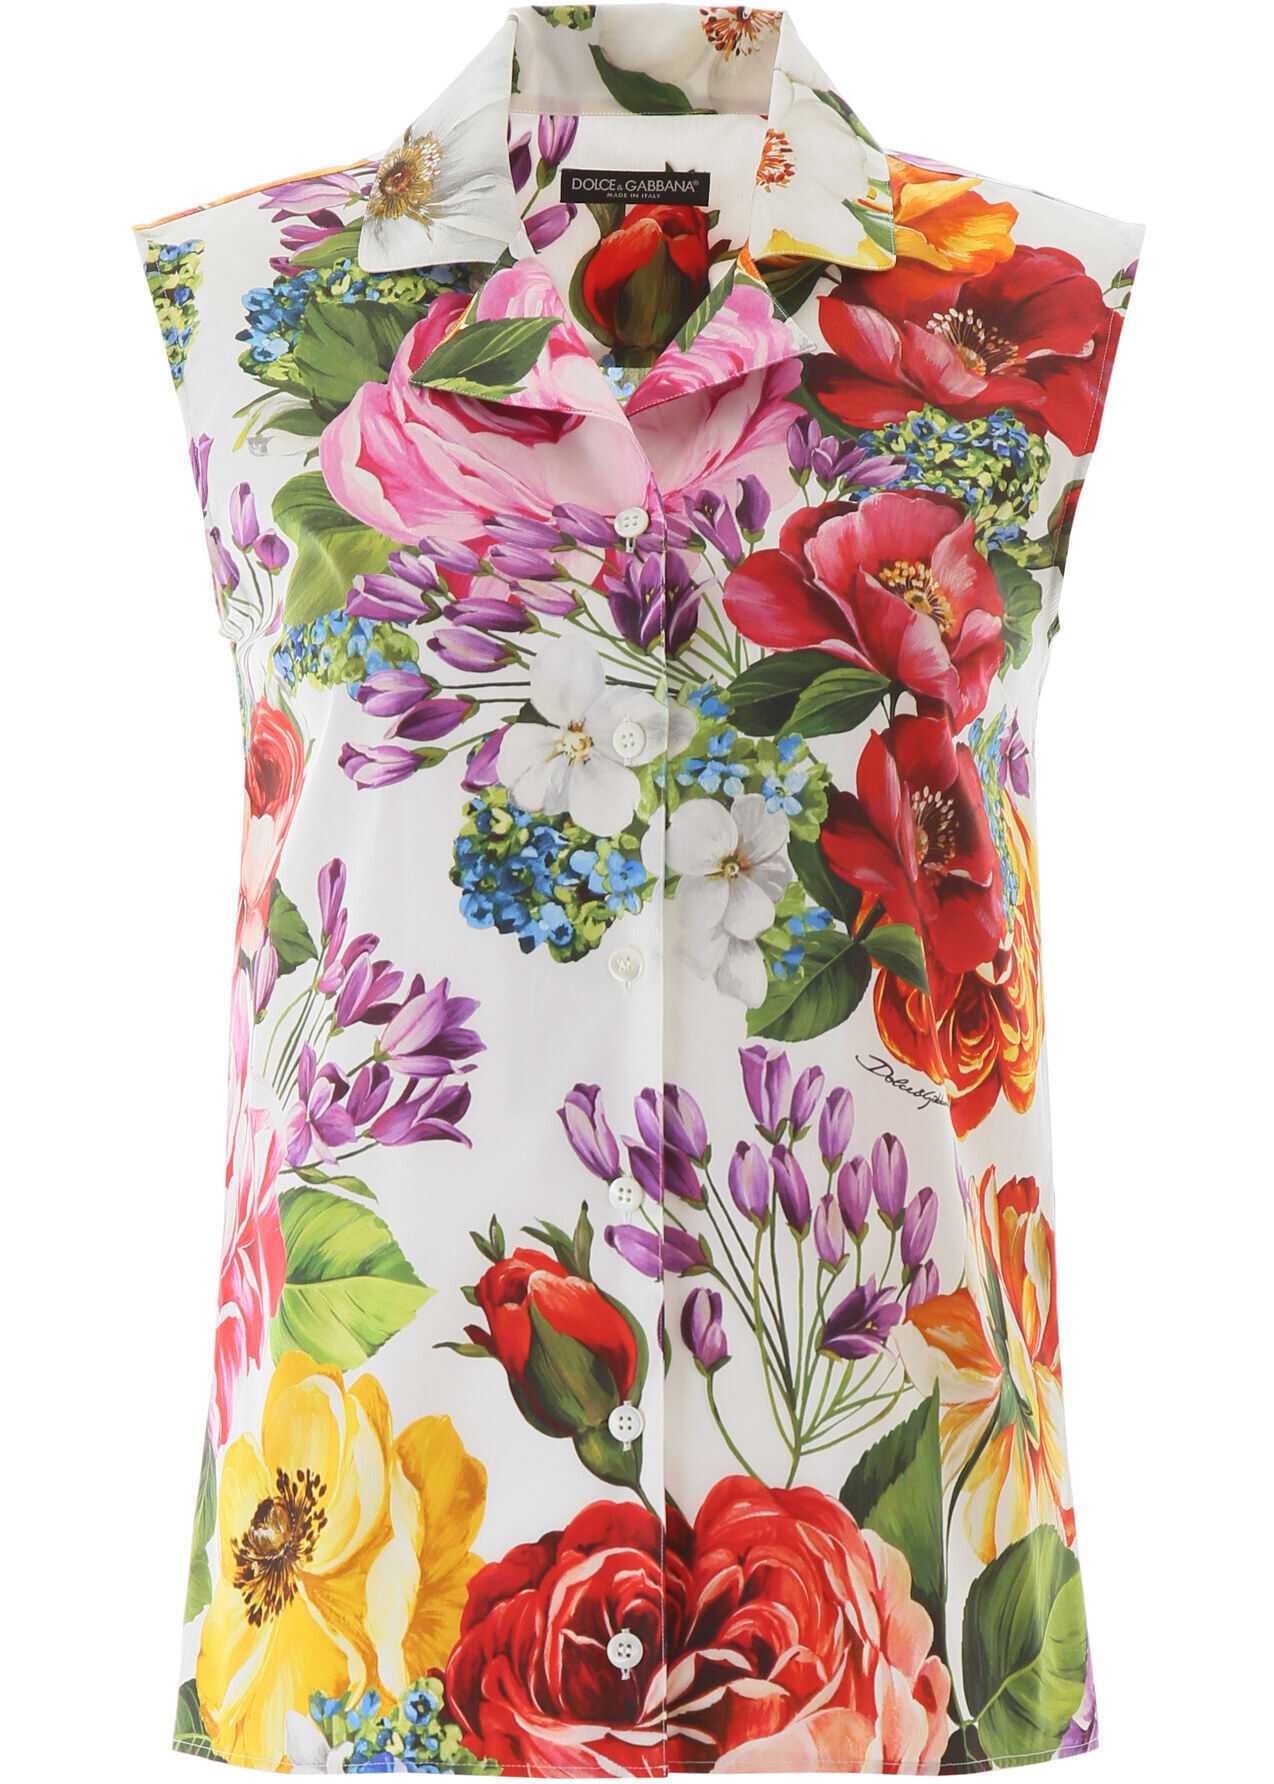 Dolce & Gabbana Floral Sleeveless Shirt MIX FIORI FDO BIANCO